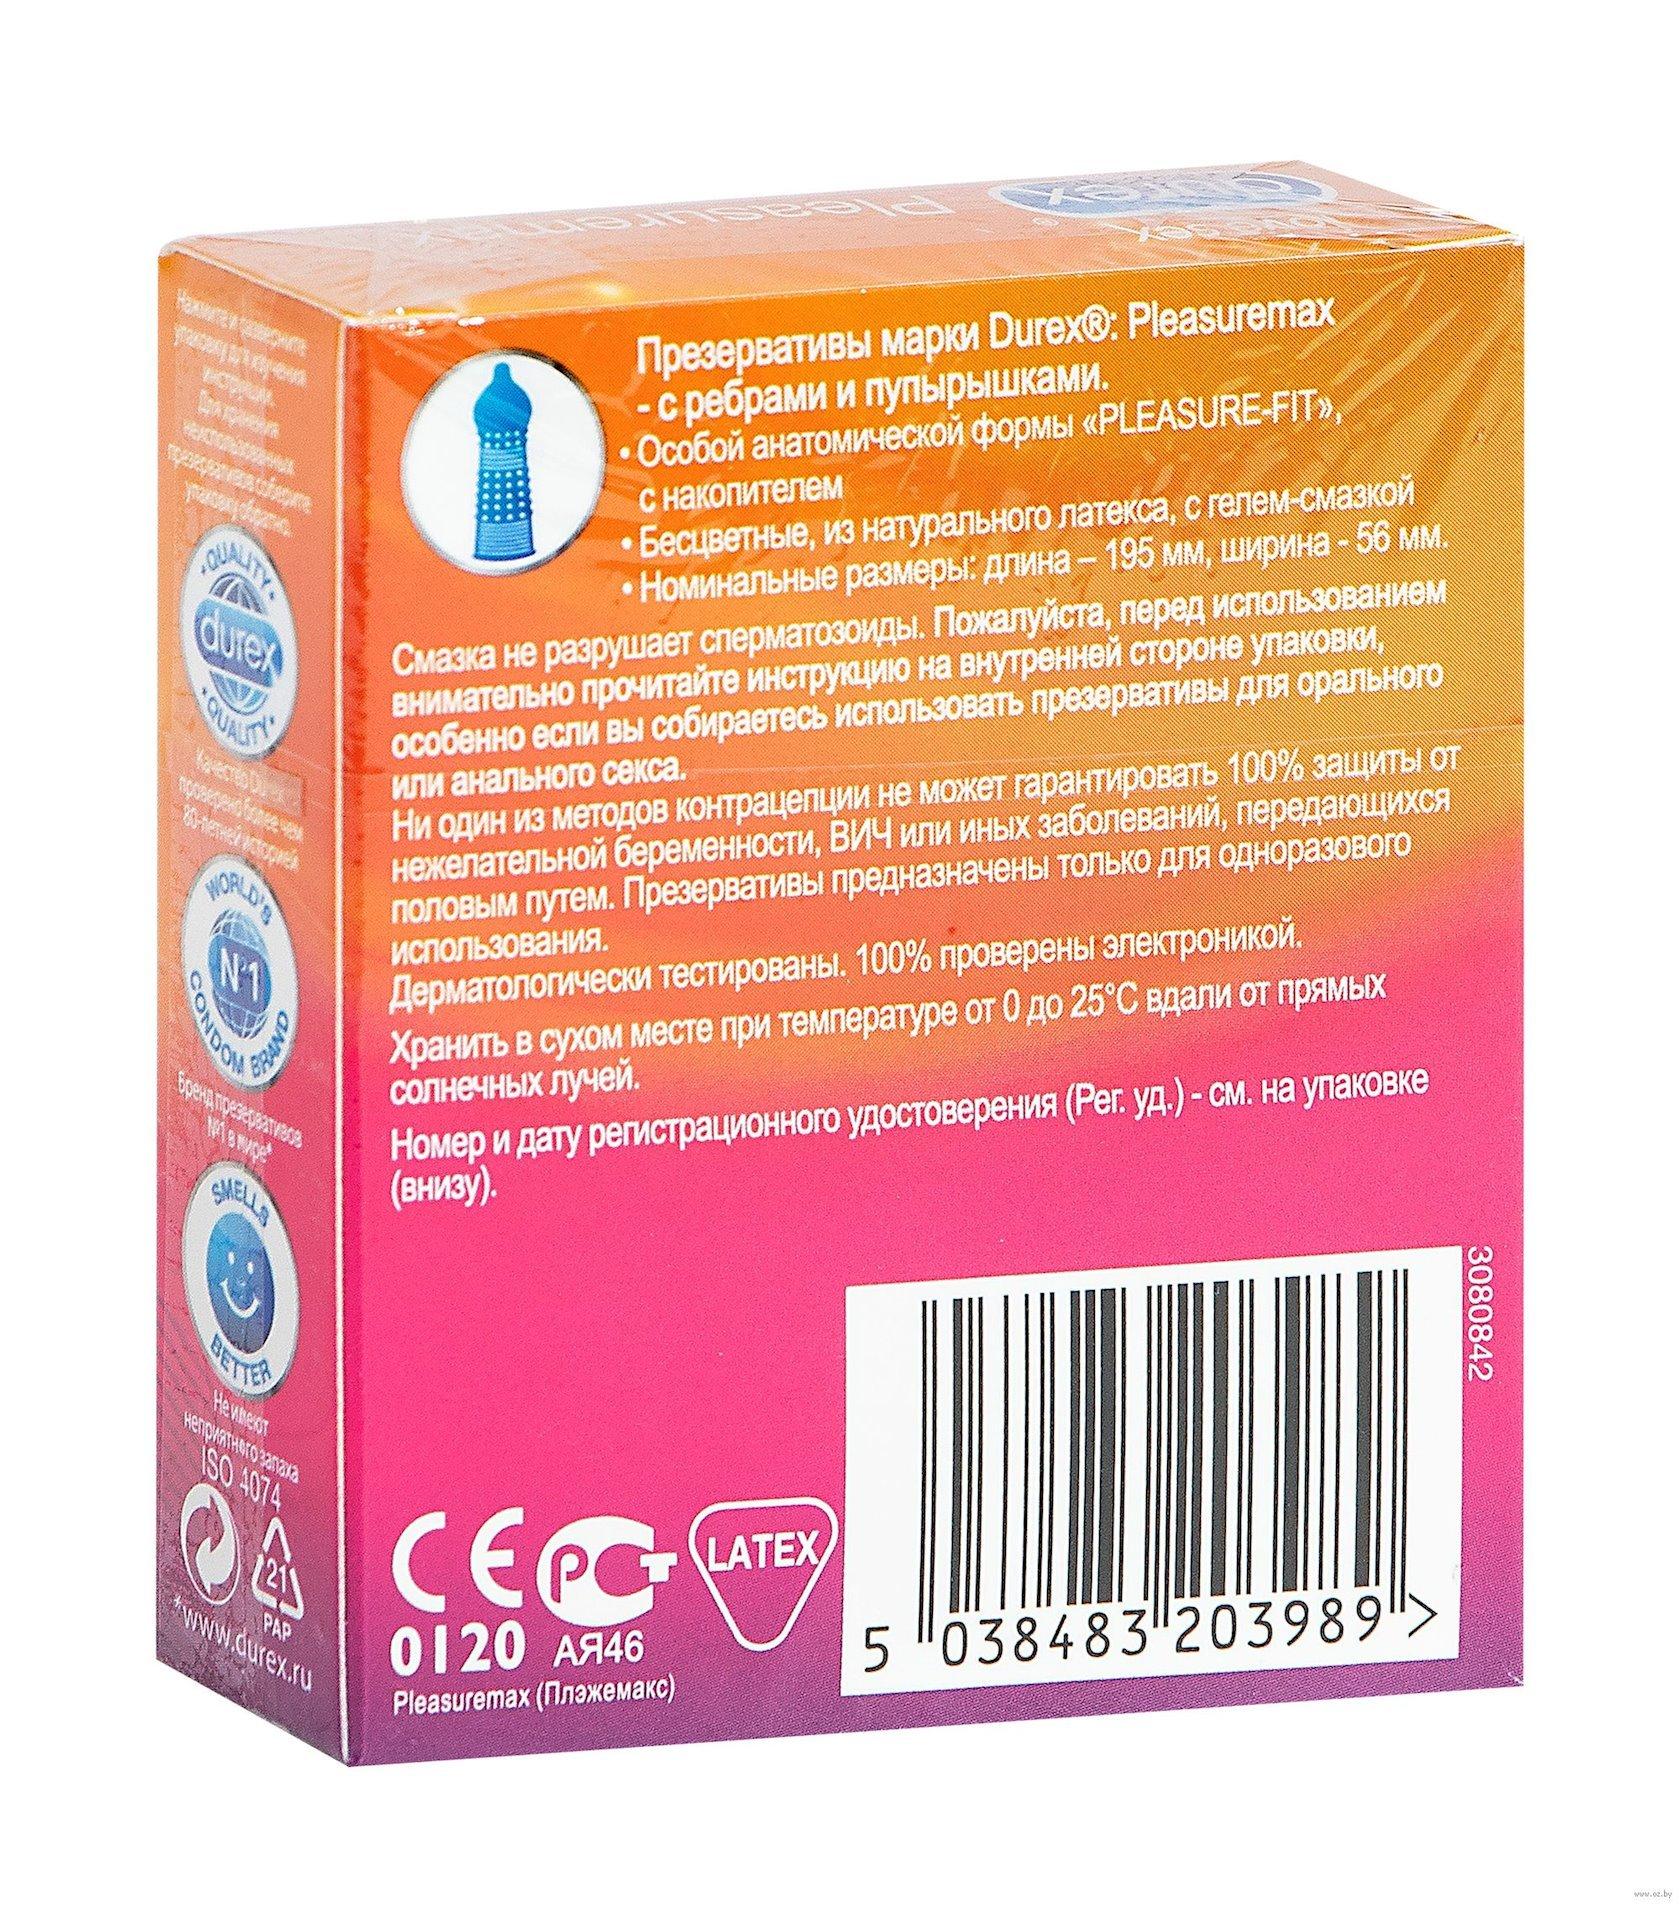 Prezervativlər Durex Pleasuremax 3 ədəd